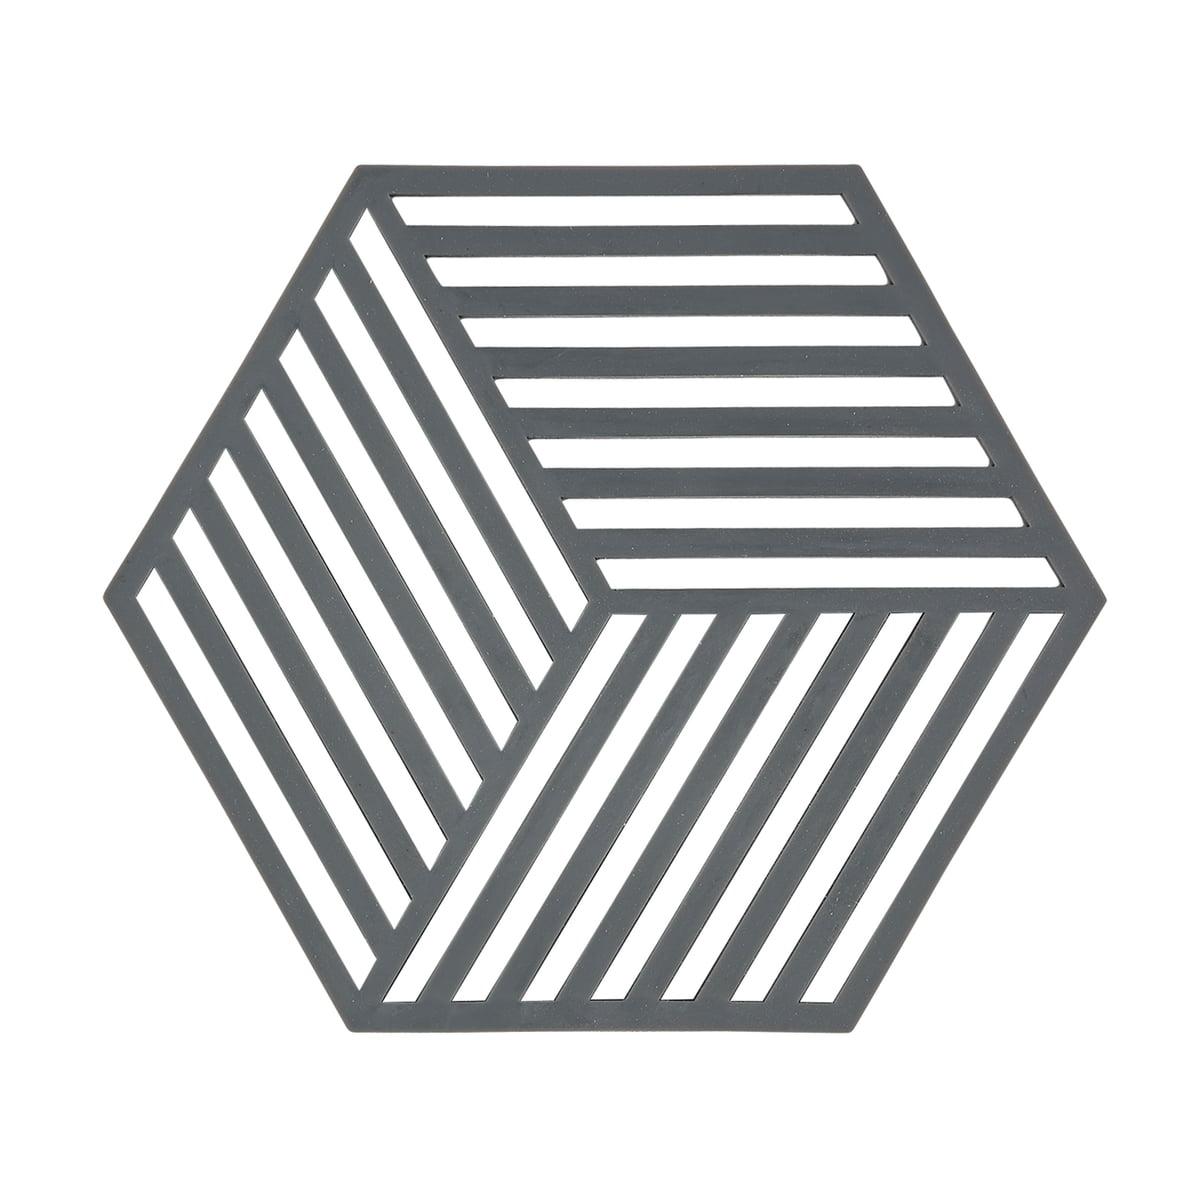 Hexagon Trivet By Zone Denmark Connox